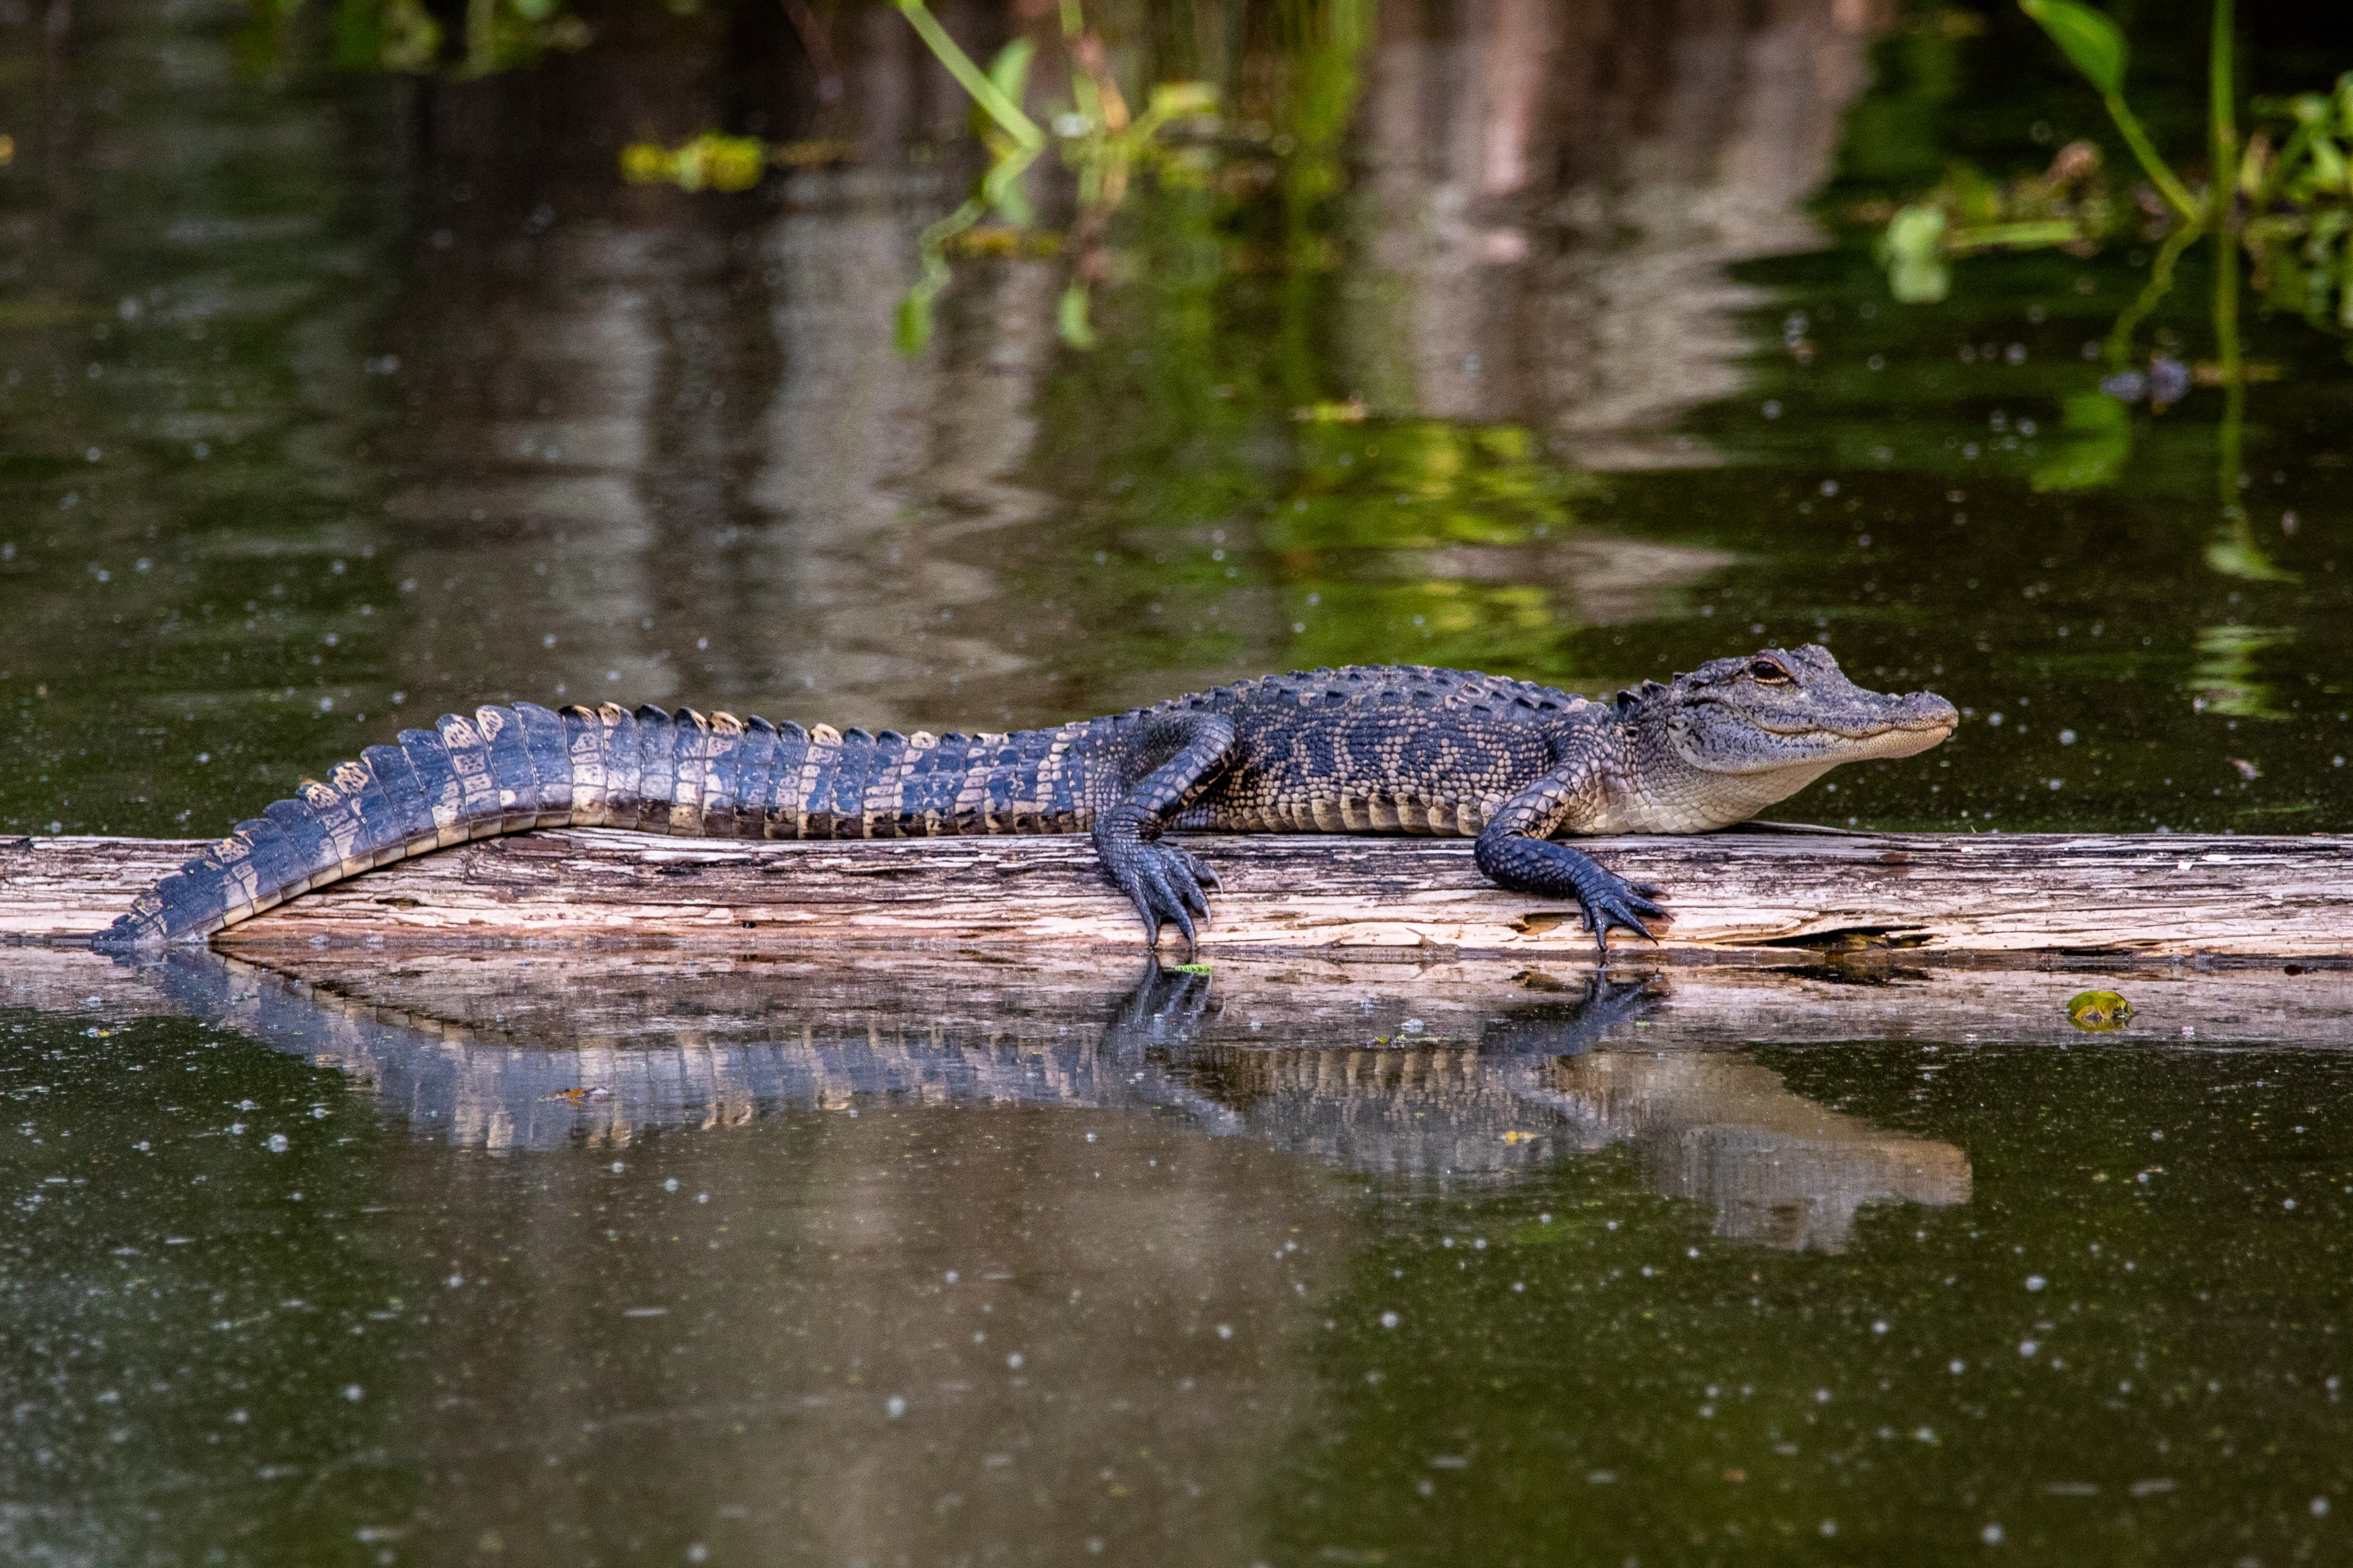 A gator basking on a floating log.